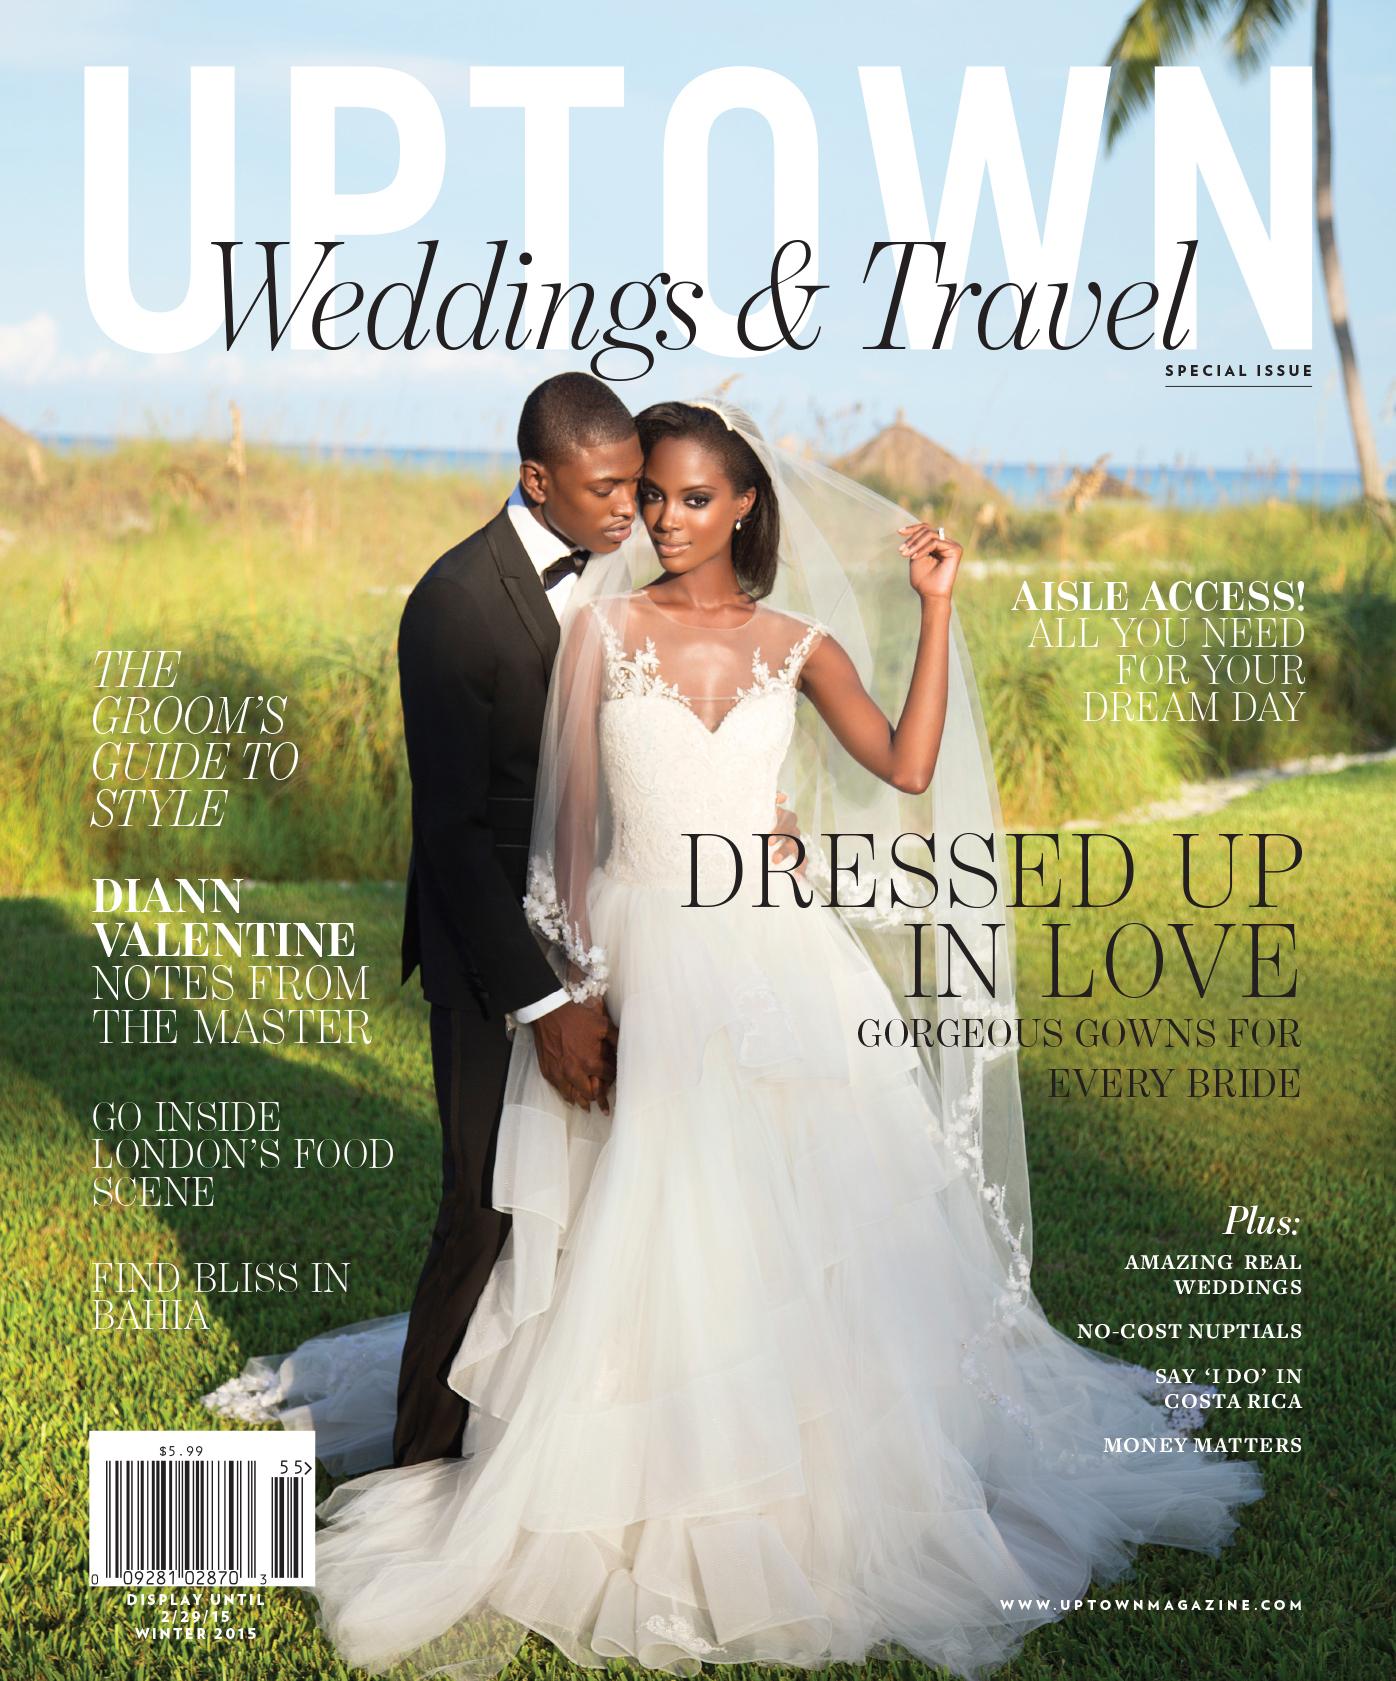 uptown wedding hope misterek